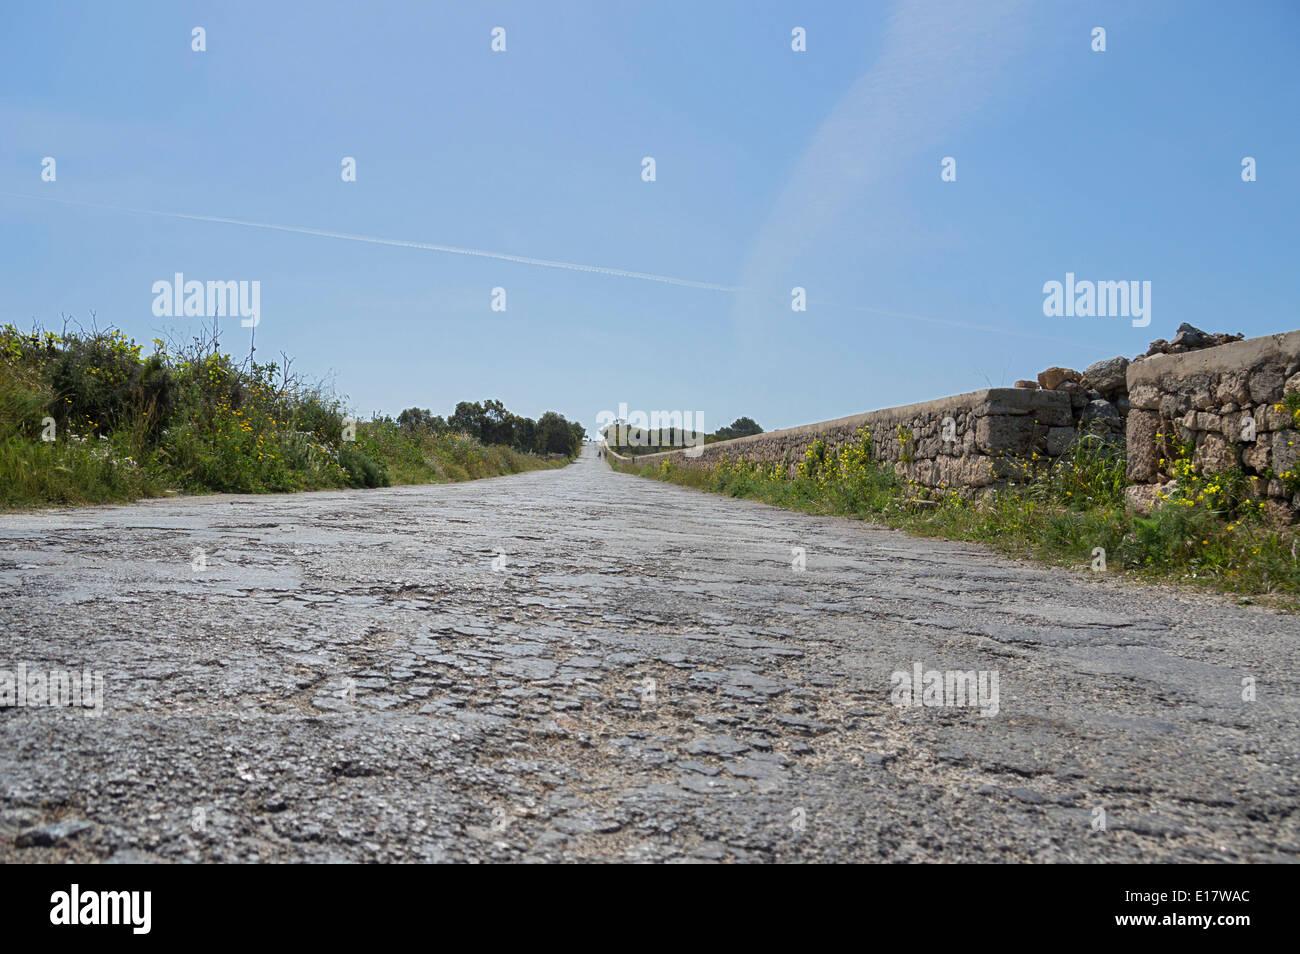 Rau, uneben, holprig, Arm, Straßen in Malta, Europa. Stockbild